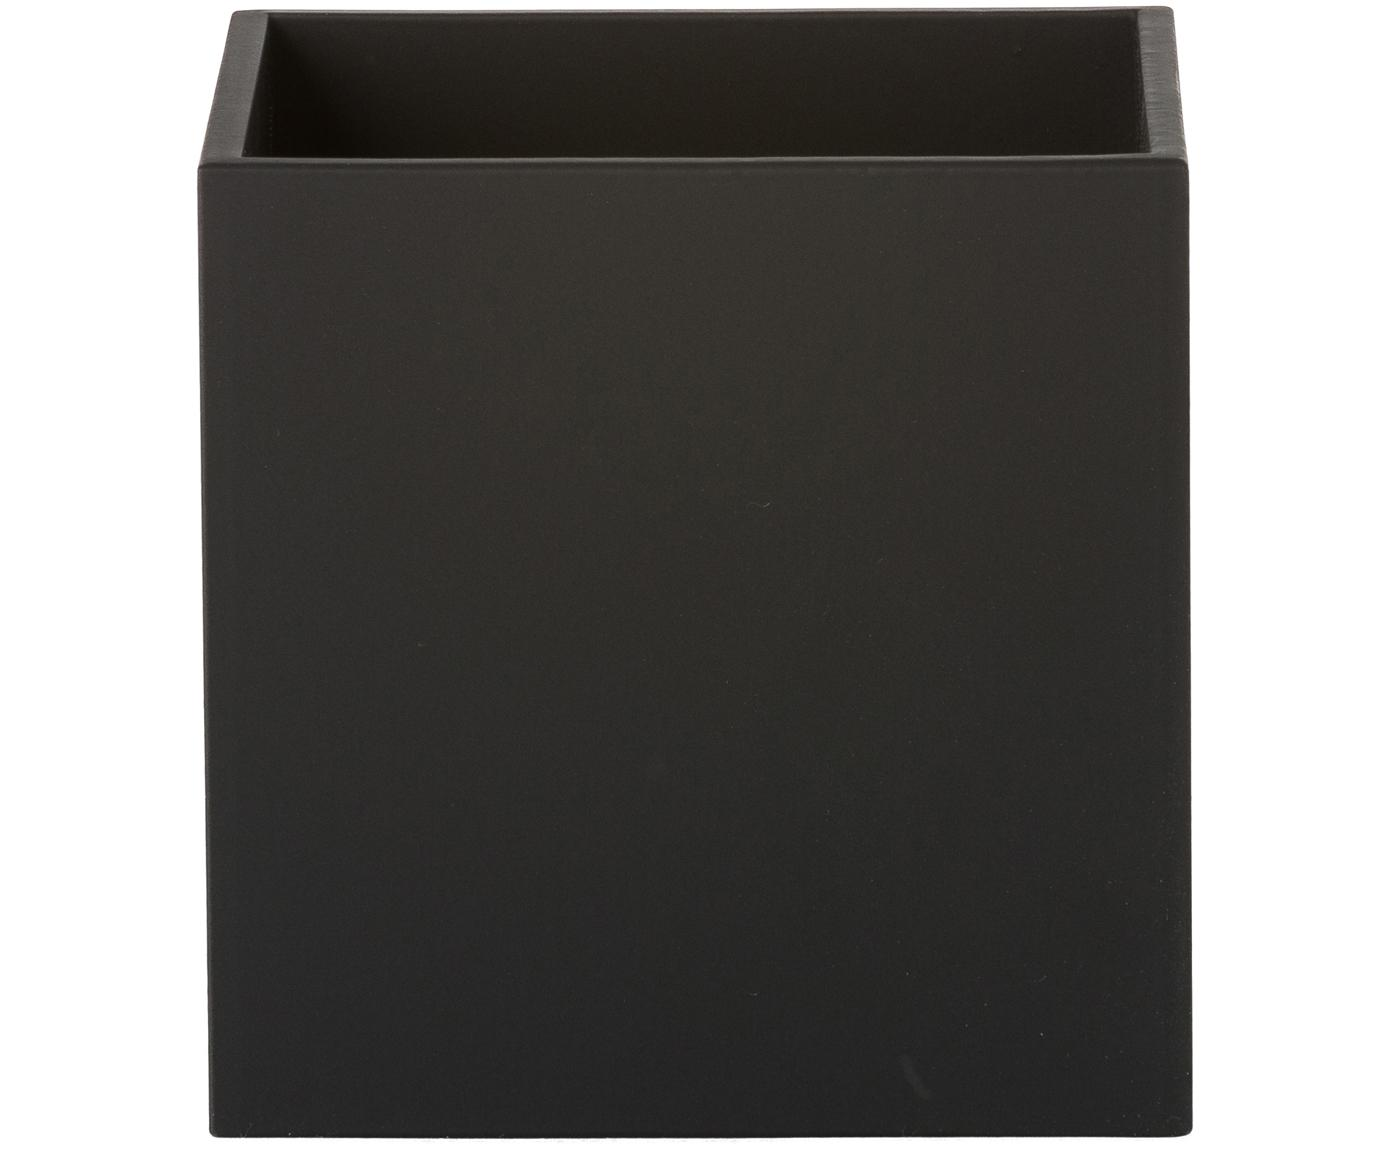 Wandleuchte Quad, Aluminium, pulverbeschichtet, Schwarz, 10 x 10 cm